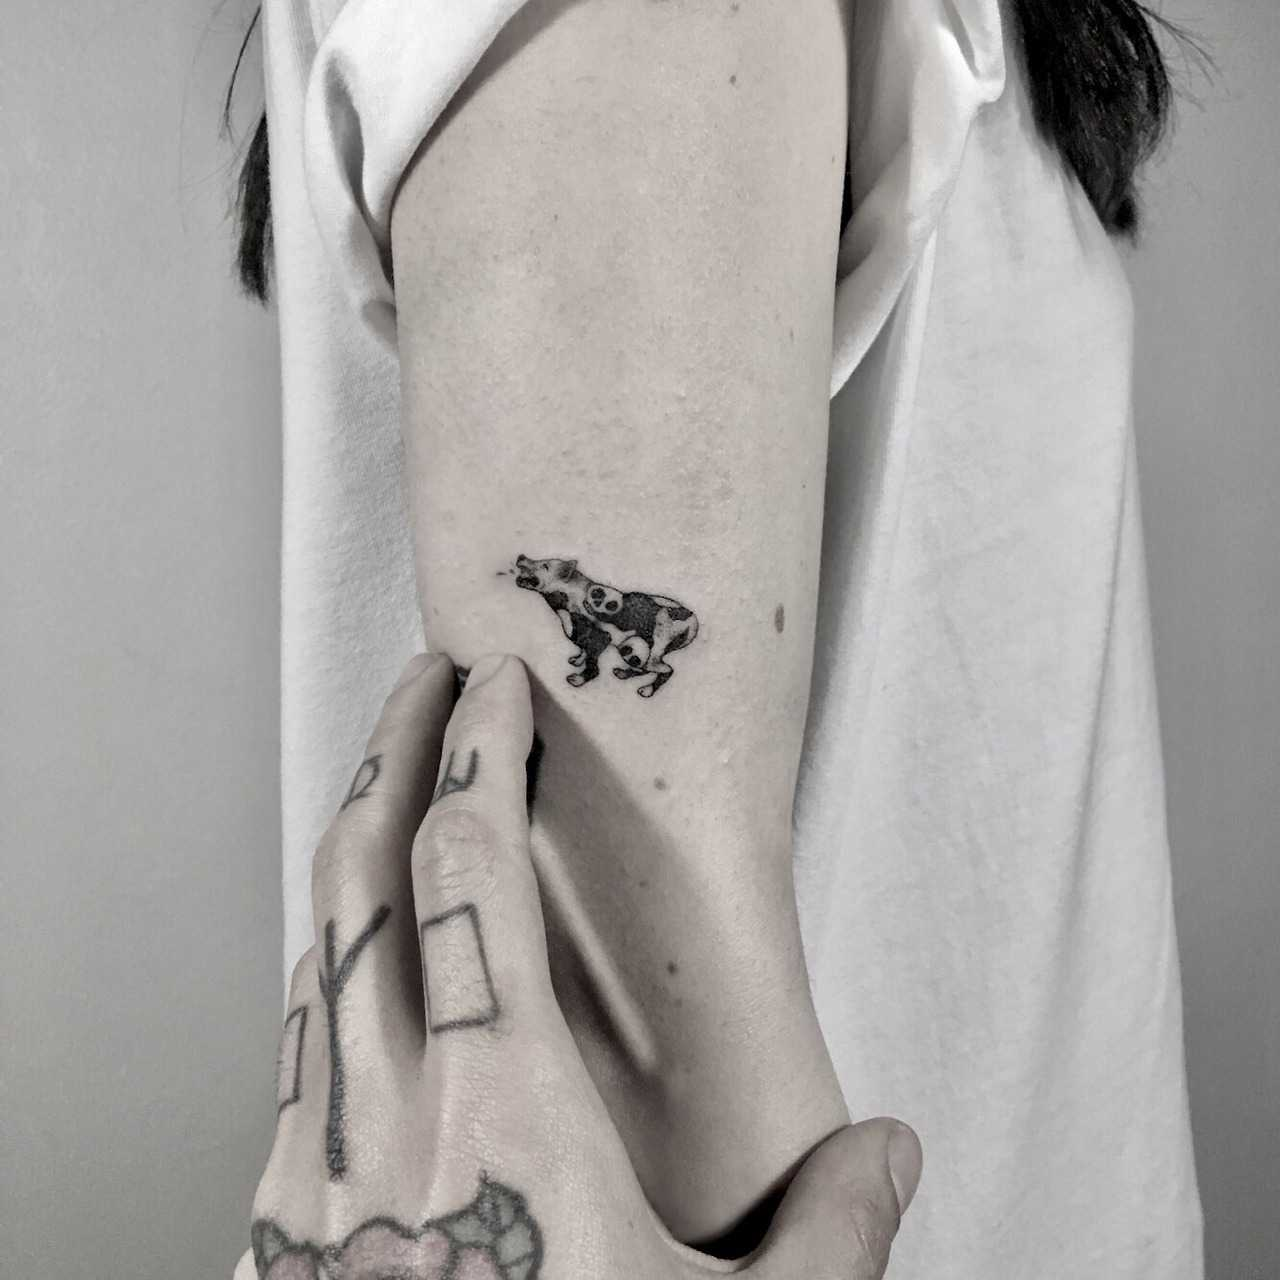 Barking dog tattoo by Berkin Dönmez